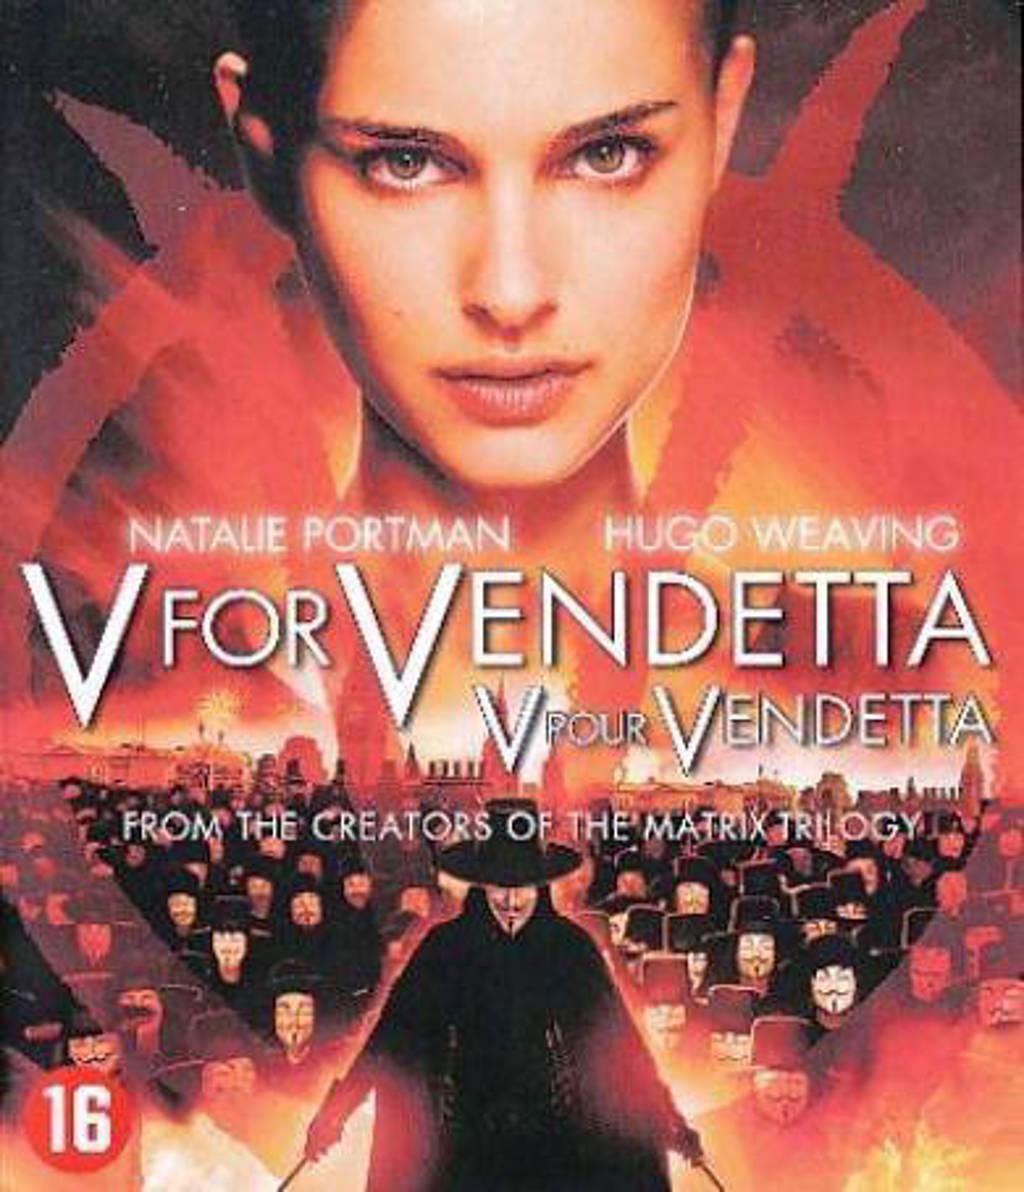 V for vendetta (Blu-ray)